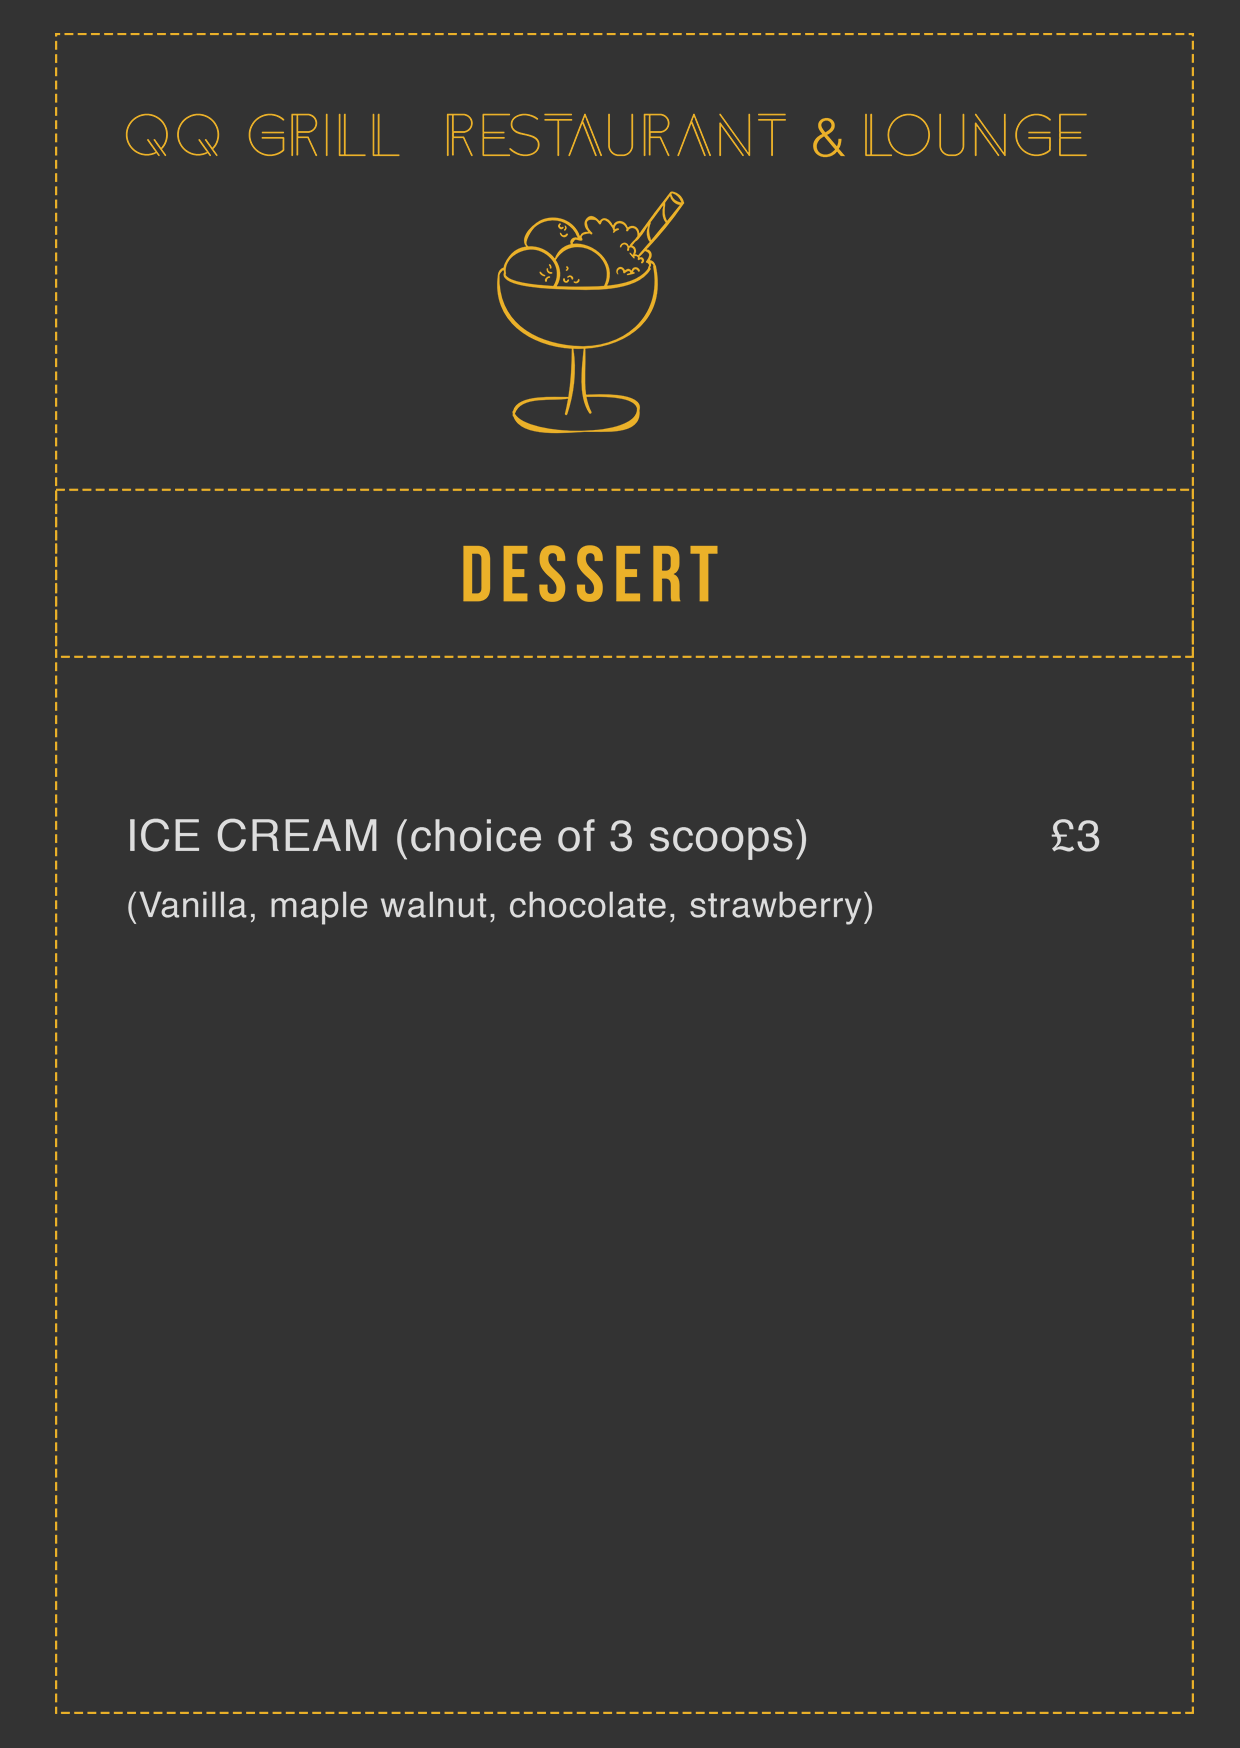 QQ Lounge dessert